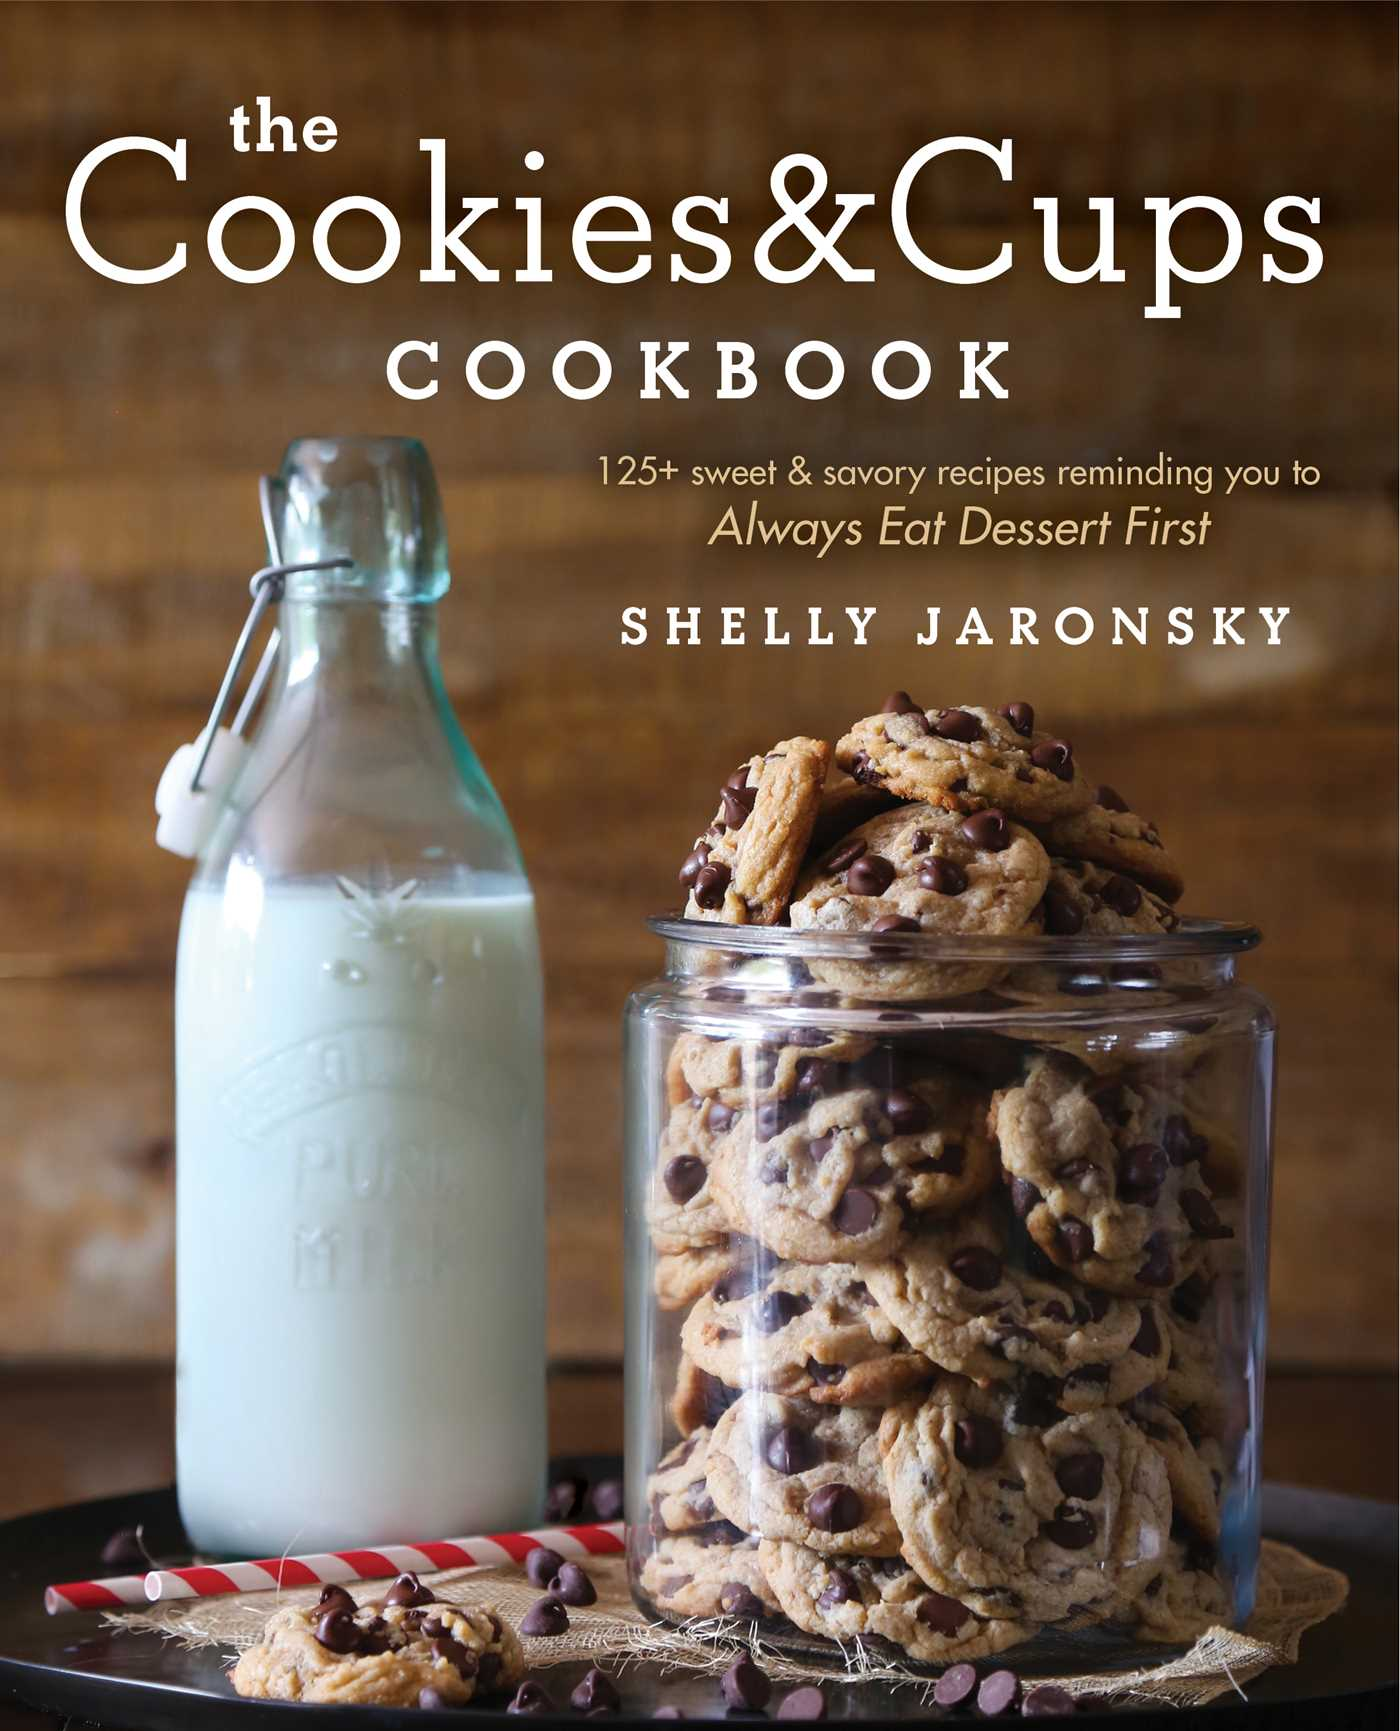 The cookies cups cookbook 9781501102561 hr